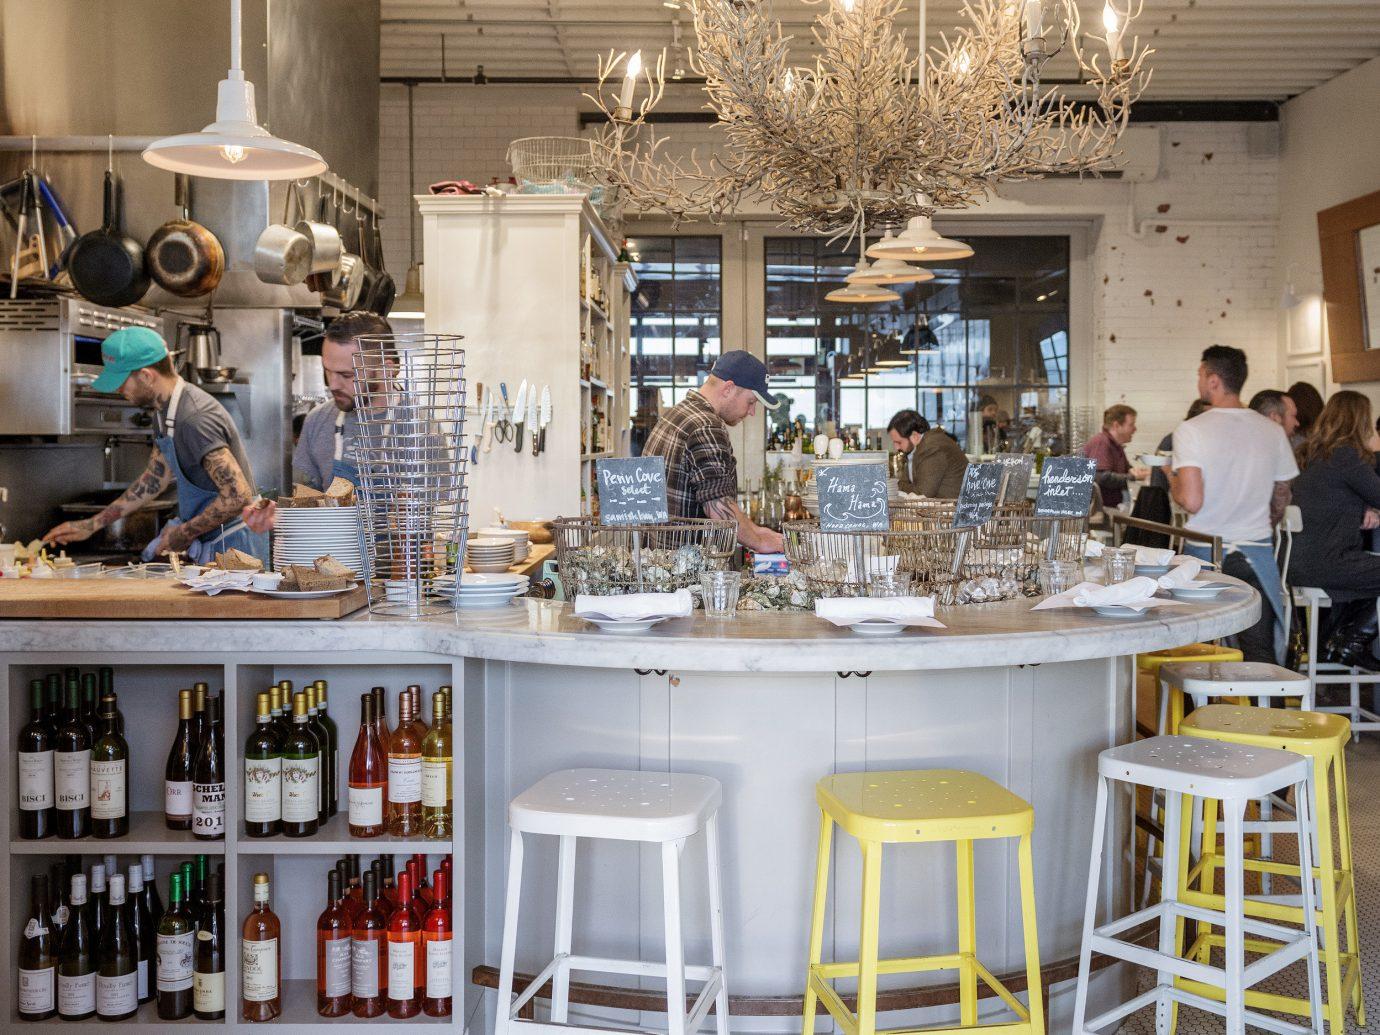 Food + Drink indoor Kitchen ceiling interior design table furniture area